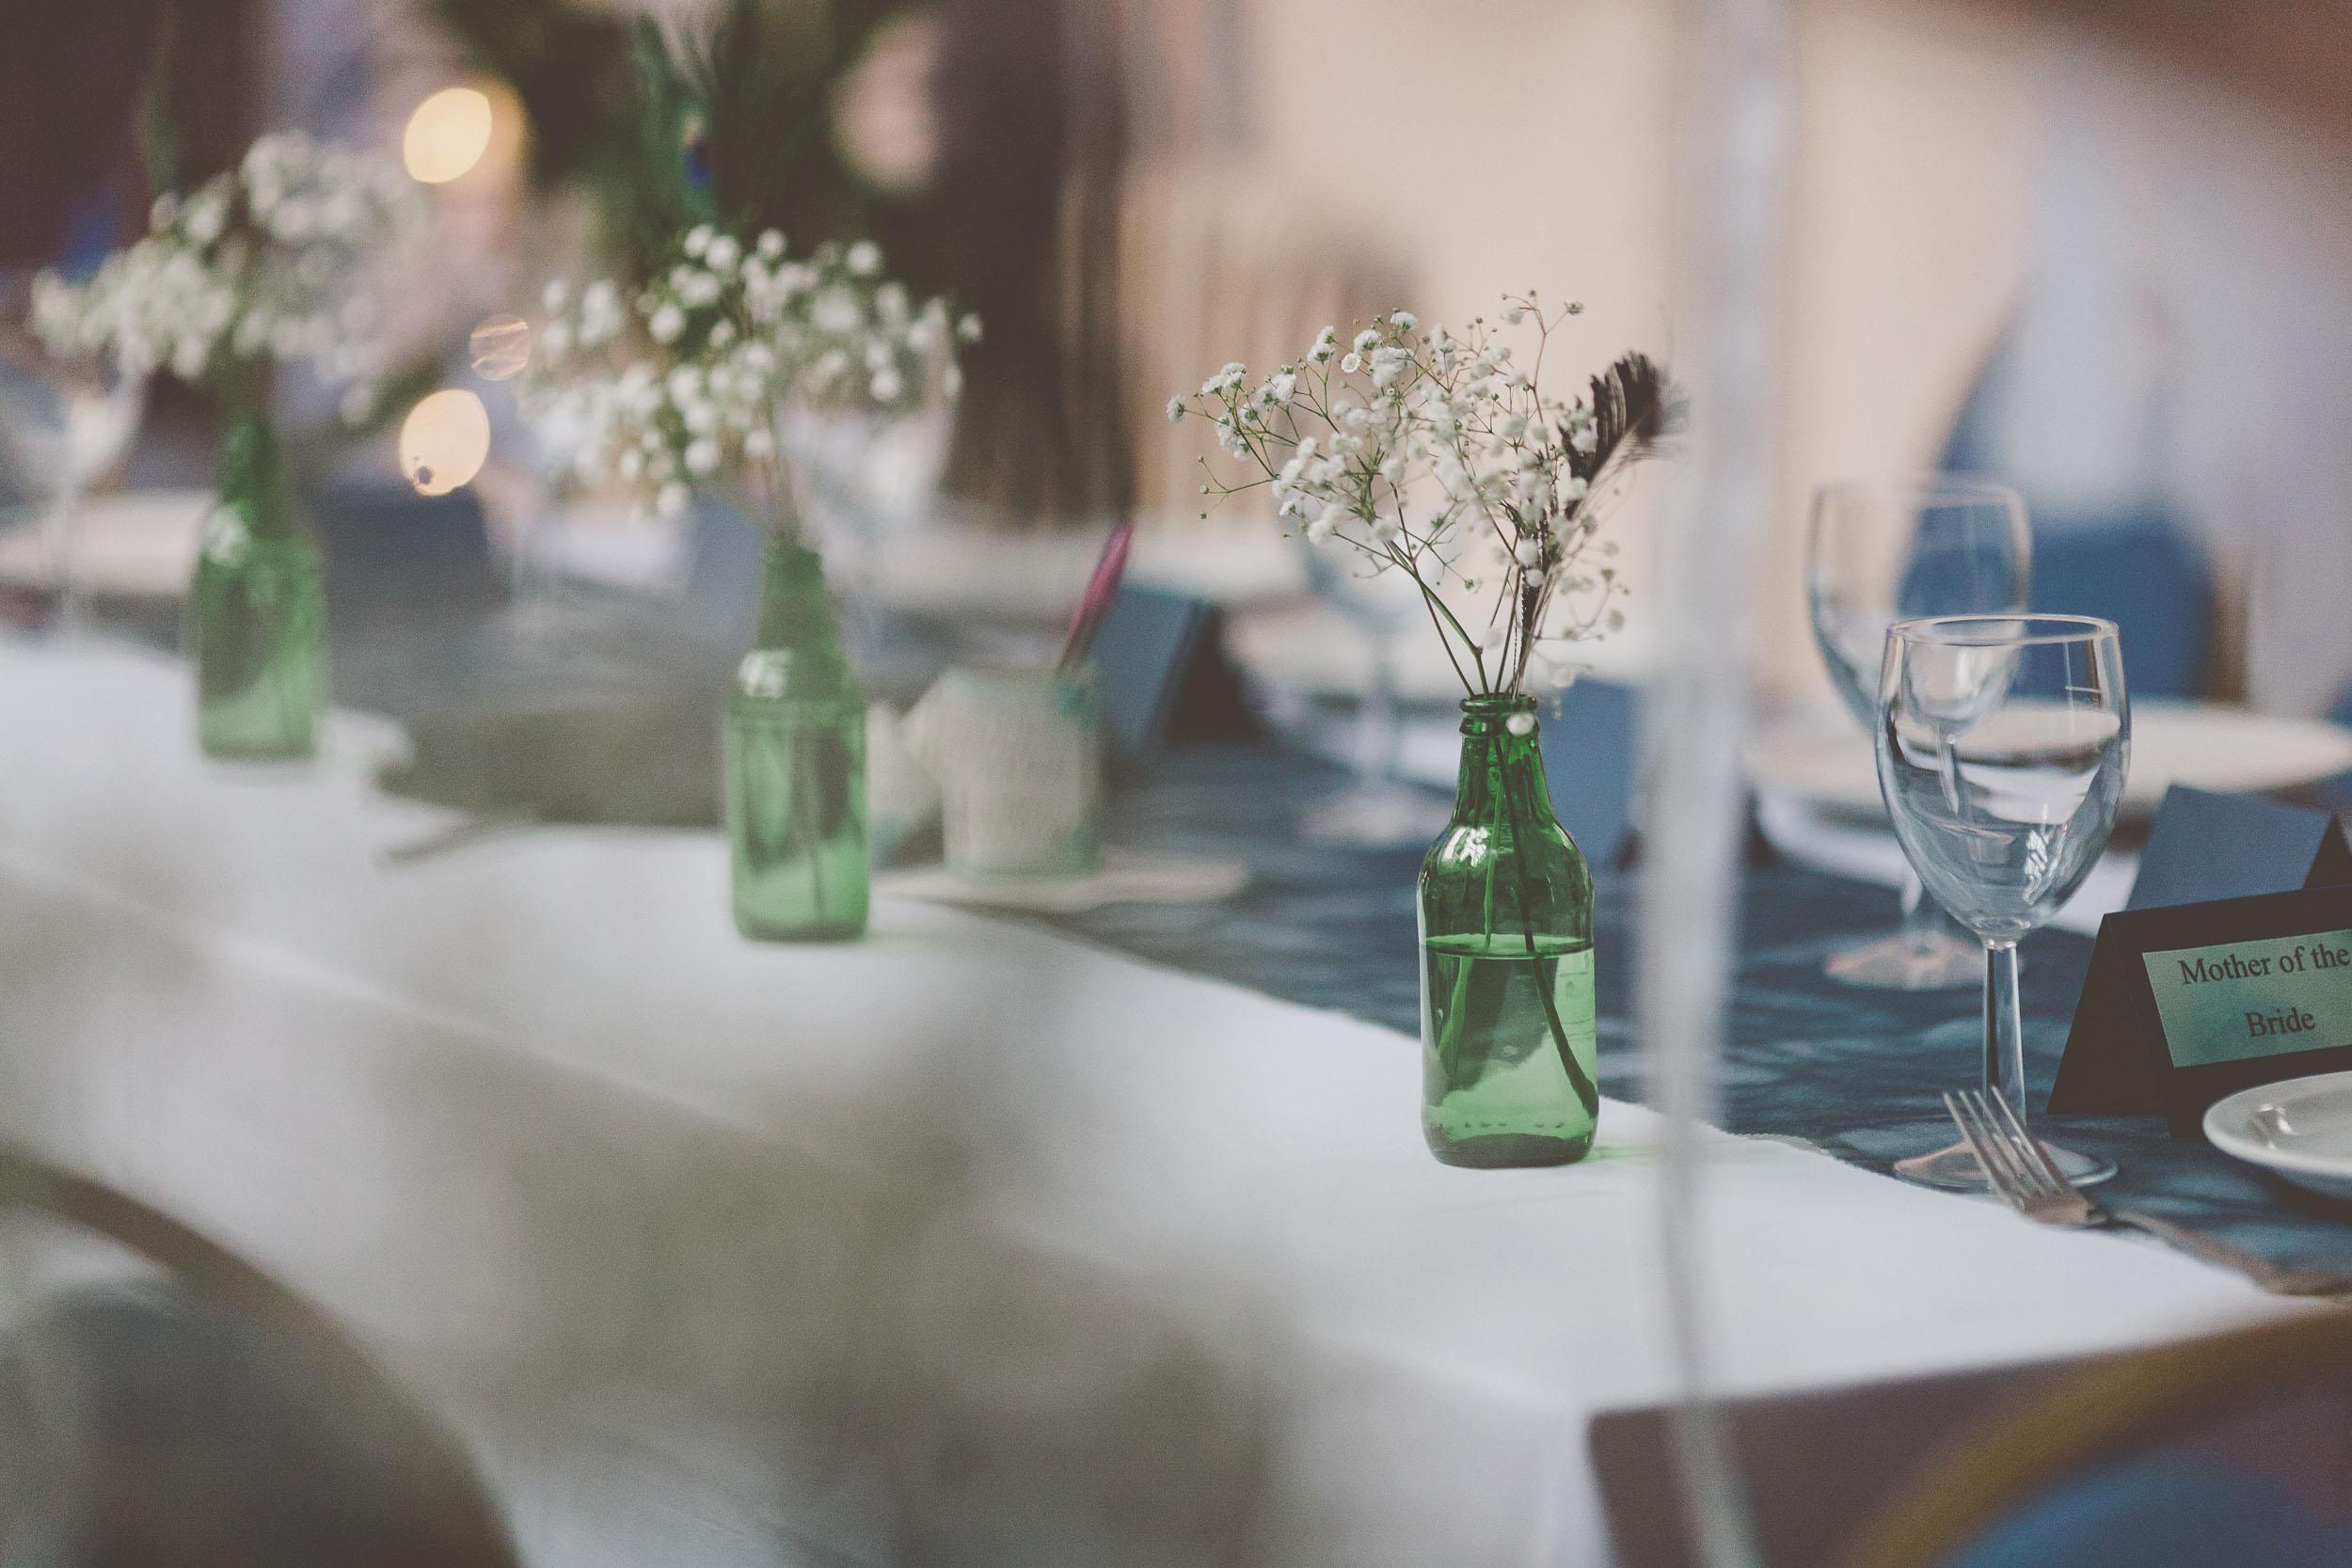 islington-town-hall-4th-floor-studios-wedding237.jpg